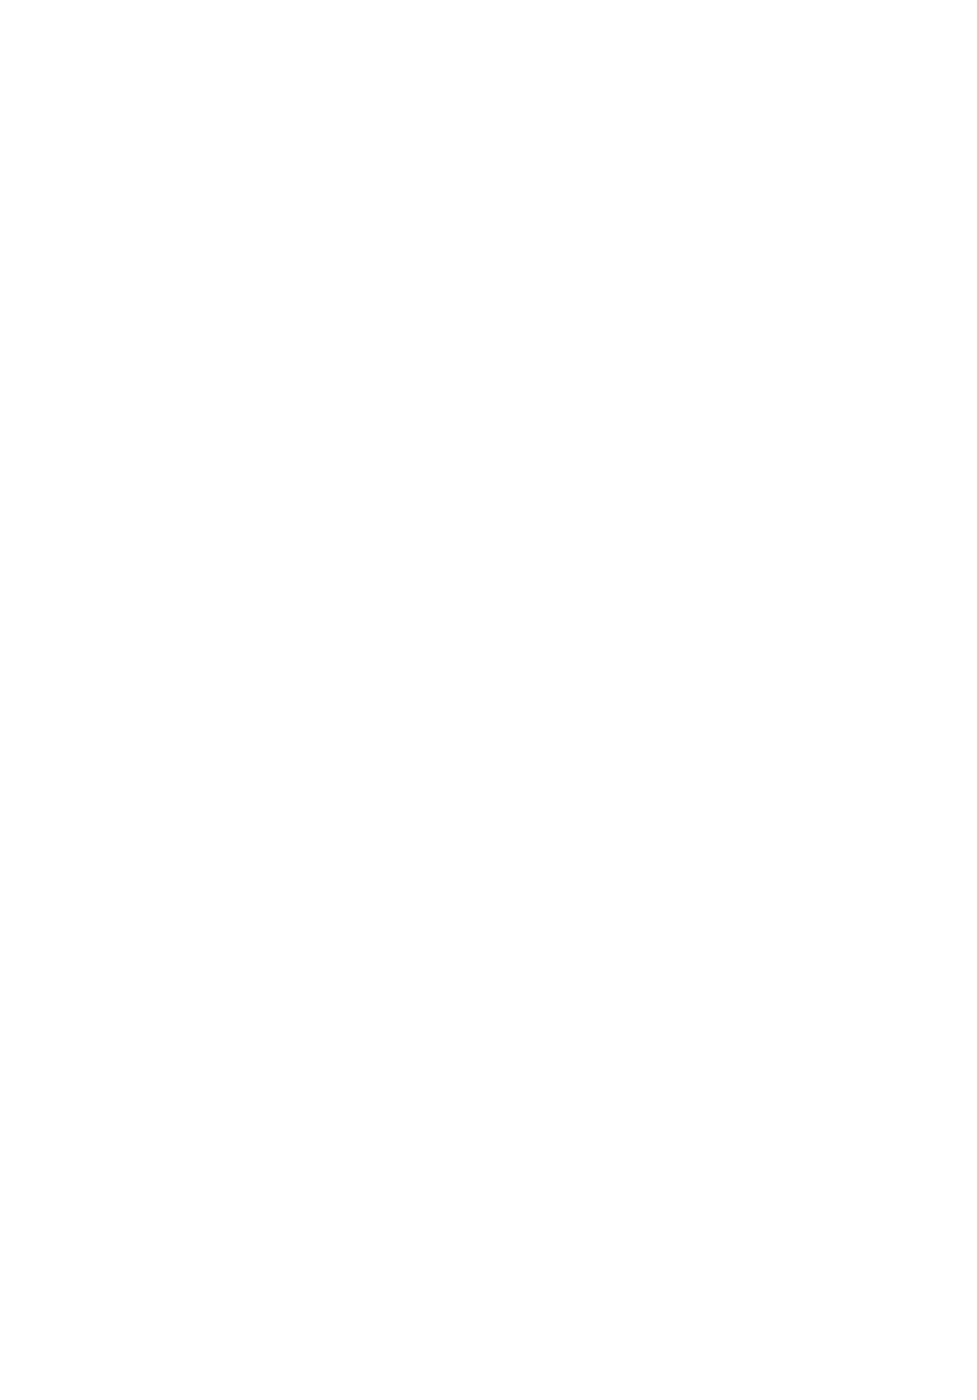 [Fujiwara Shunichi] Akogare no Hito - Woman of Yearning Ch. 1-2 [English] [FAYTEAR] [Decensored] 2